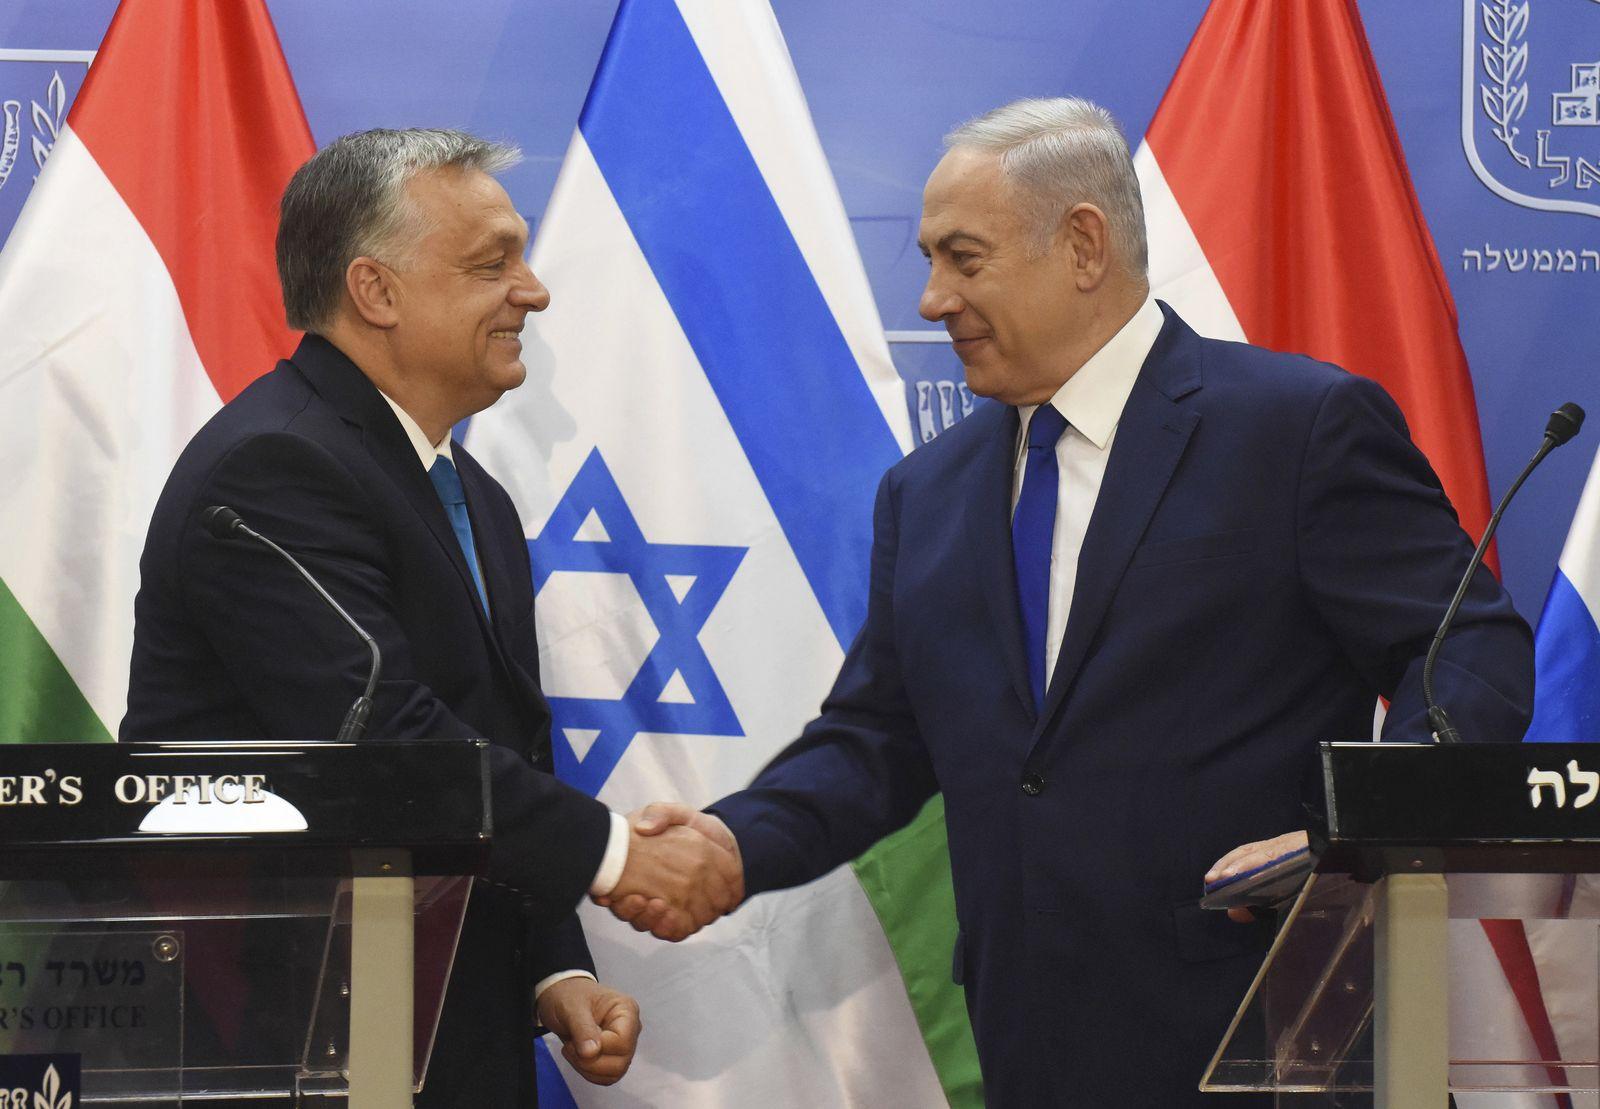 Viktor Orban und Benjamin Netanyahu